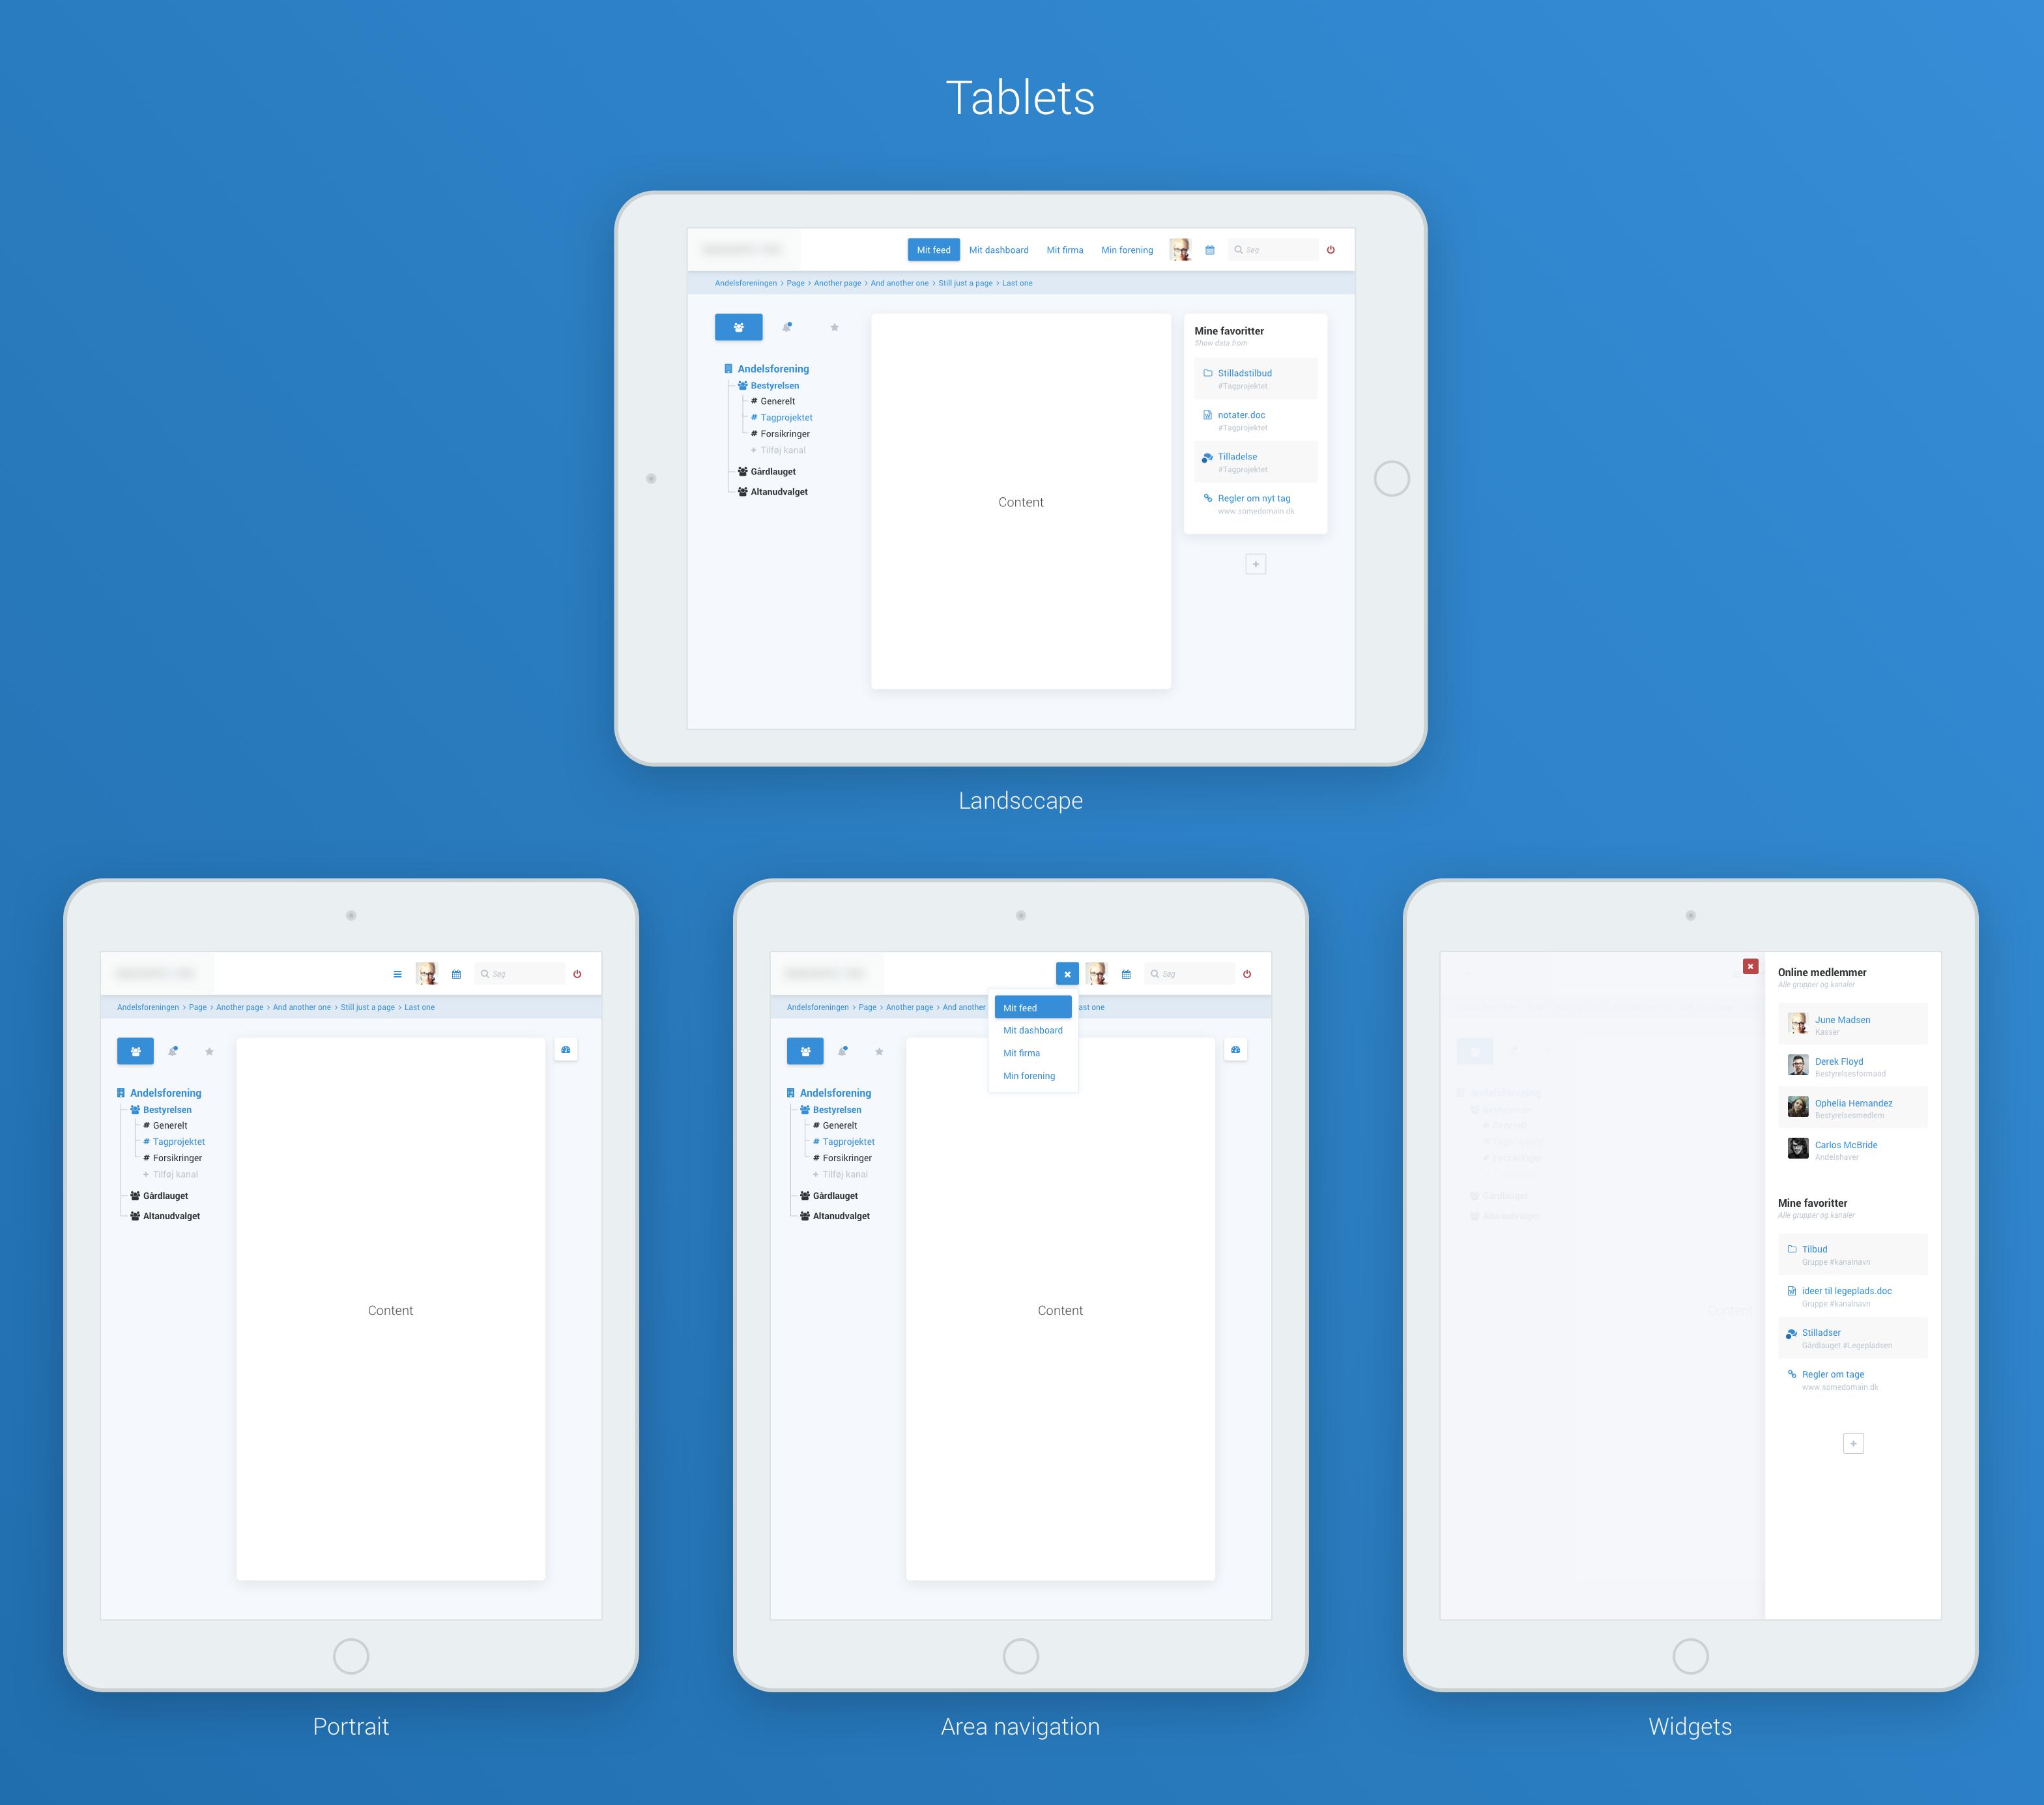 Social navigation tablets